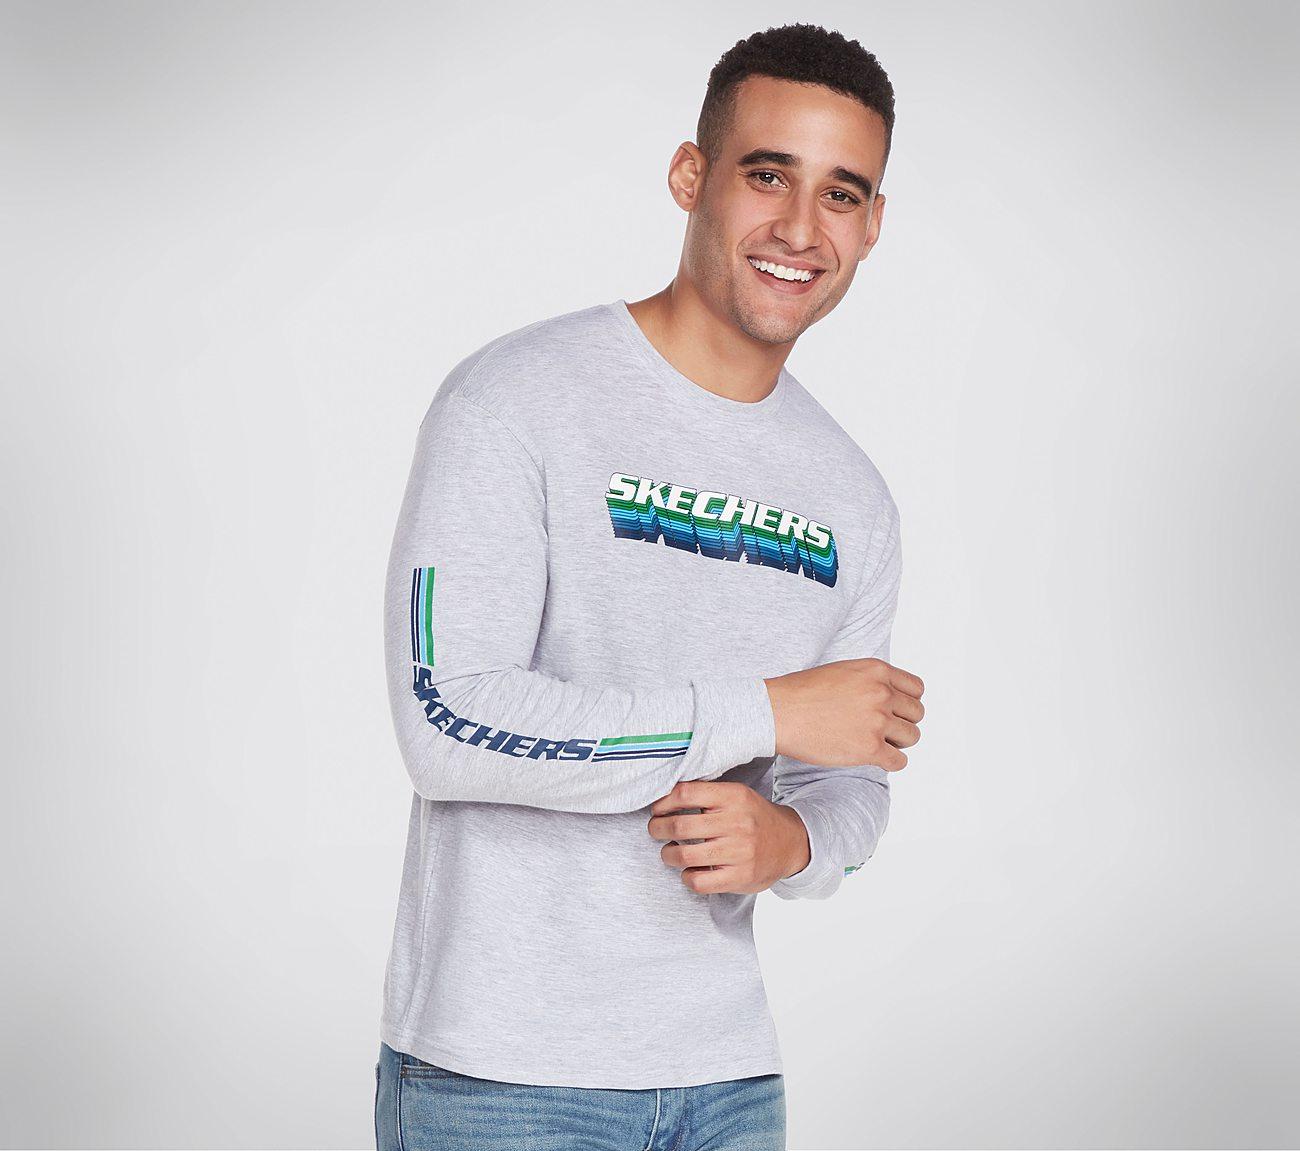 Skechers Apparel Throwback Long Sleeve Tee Shirt